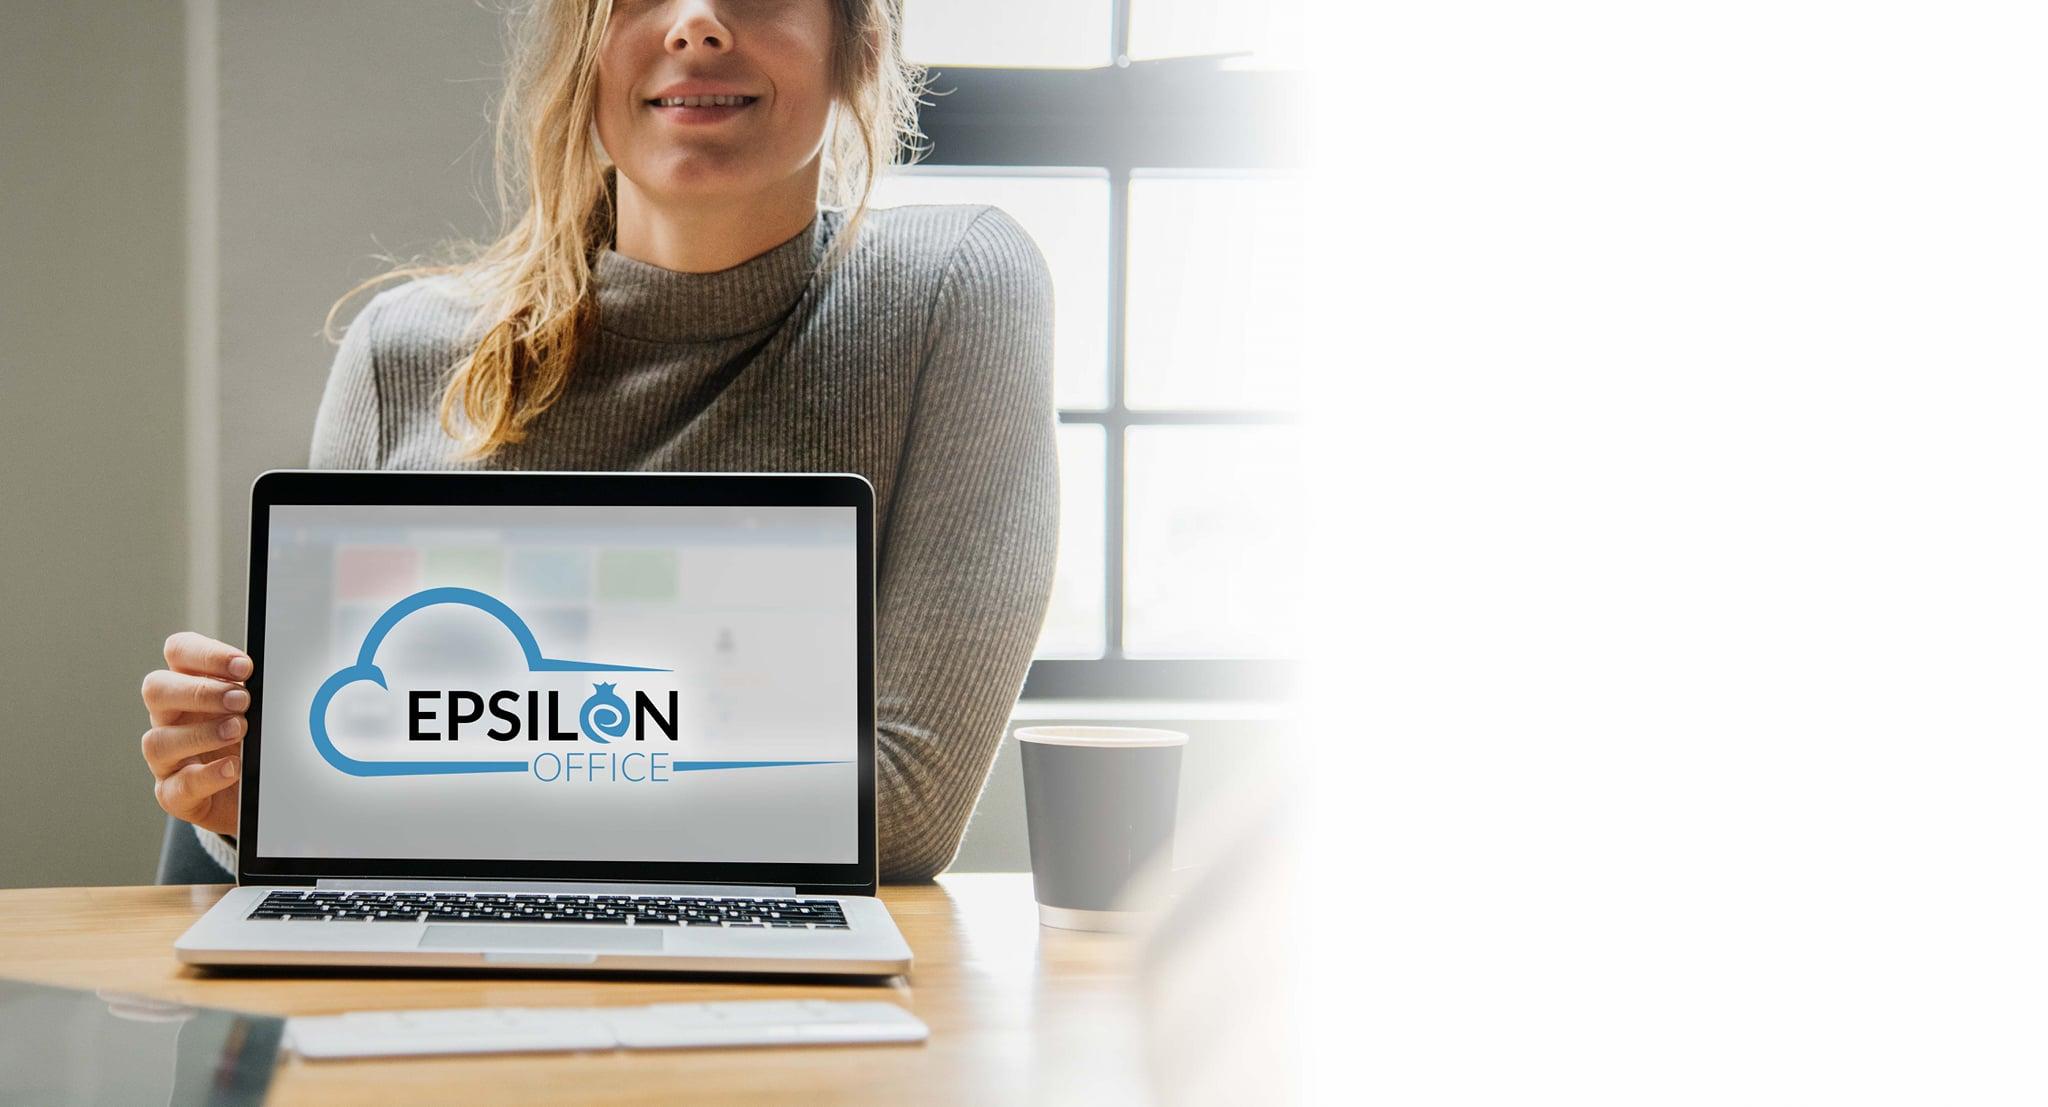 woman showing epsilon office on laptop